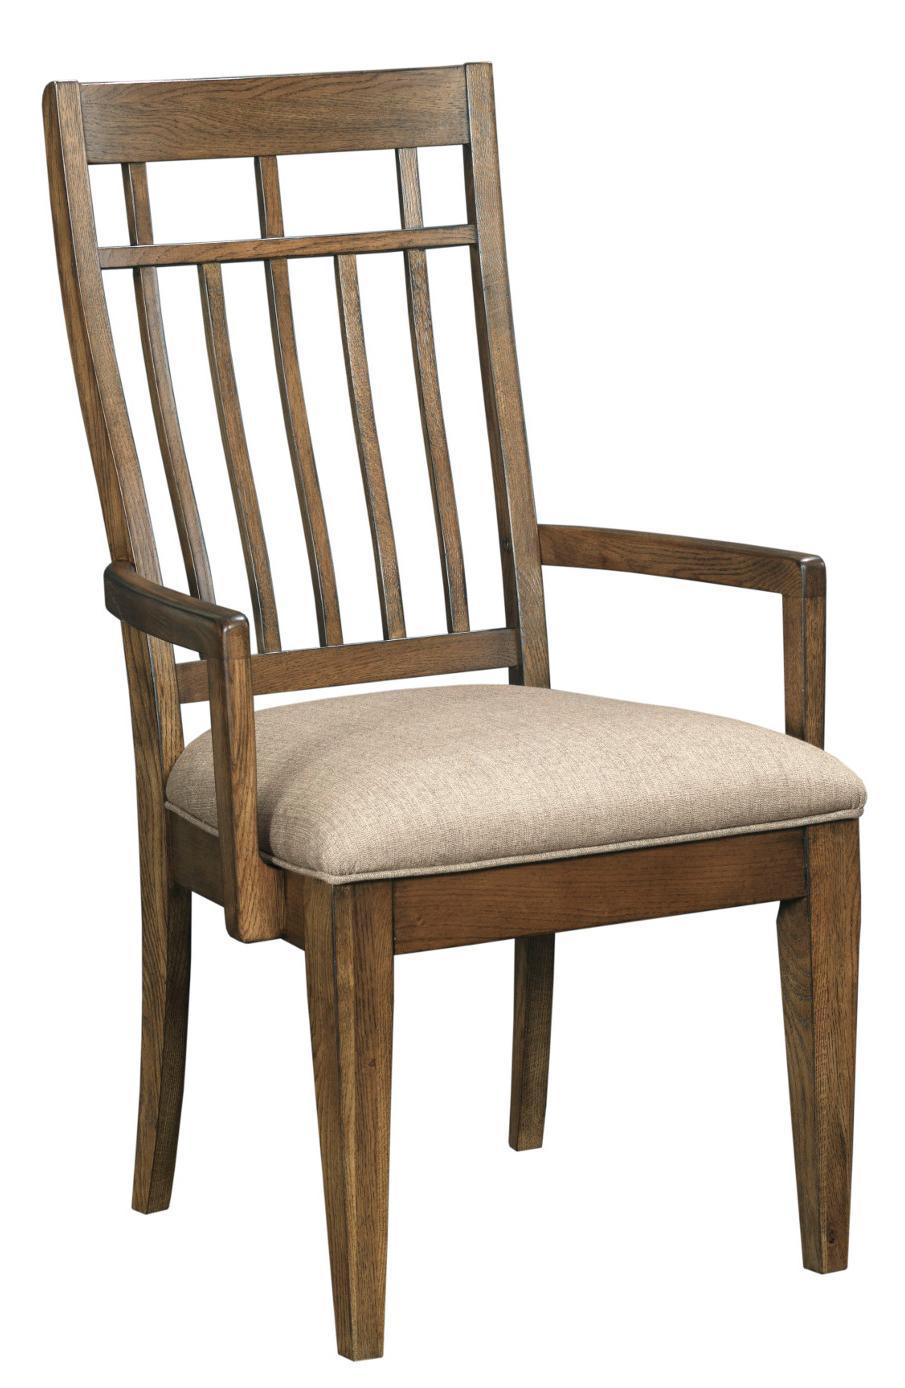 Kincaid Furniture Bedford Park Surrey Arm Chair - Item Number: 74-062